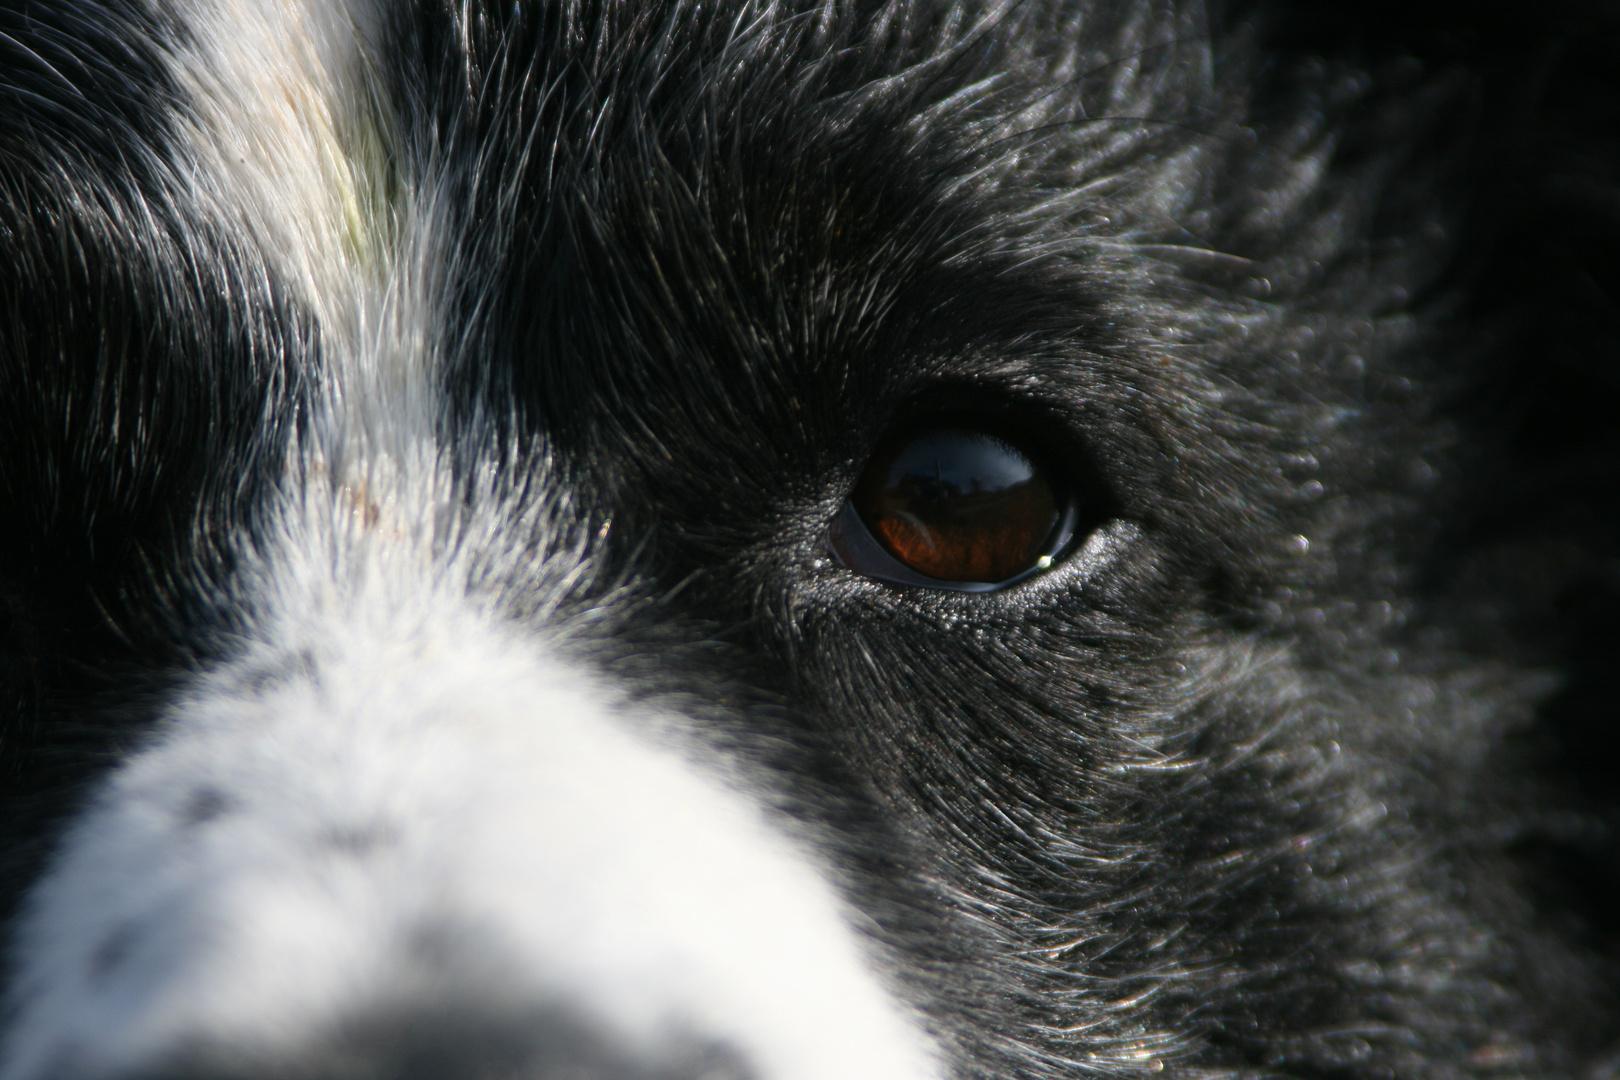 The eye of the Ti... äh dog :P